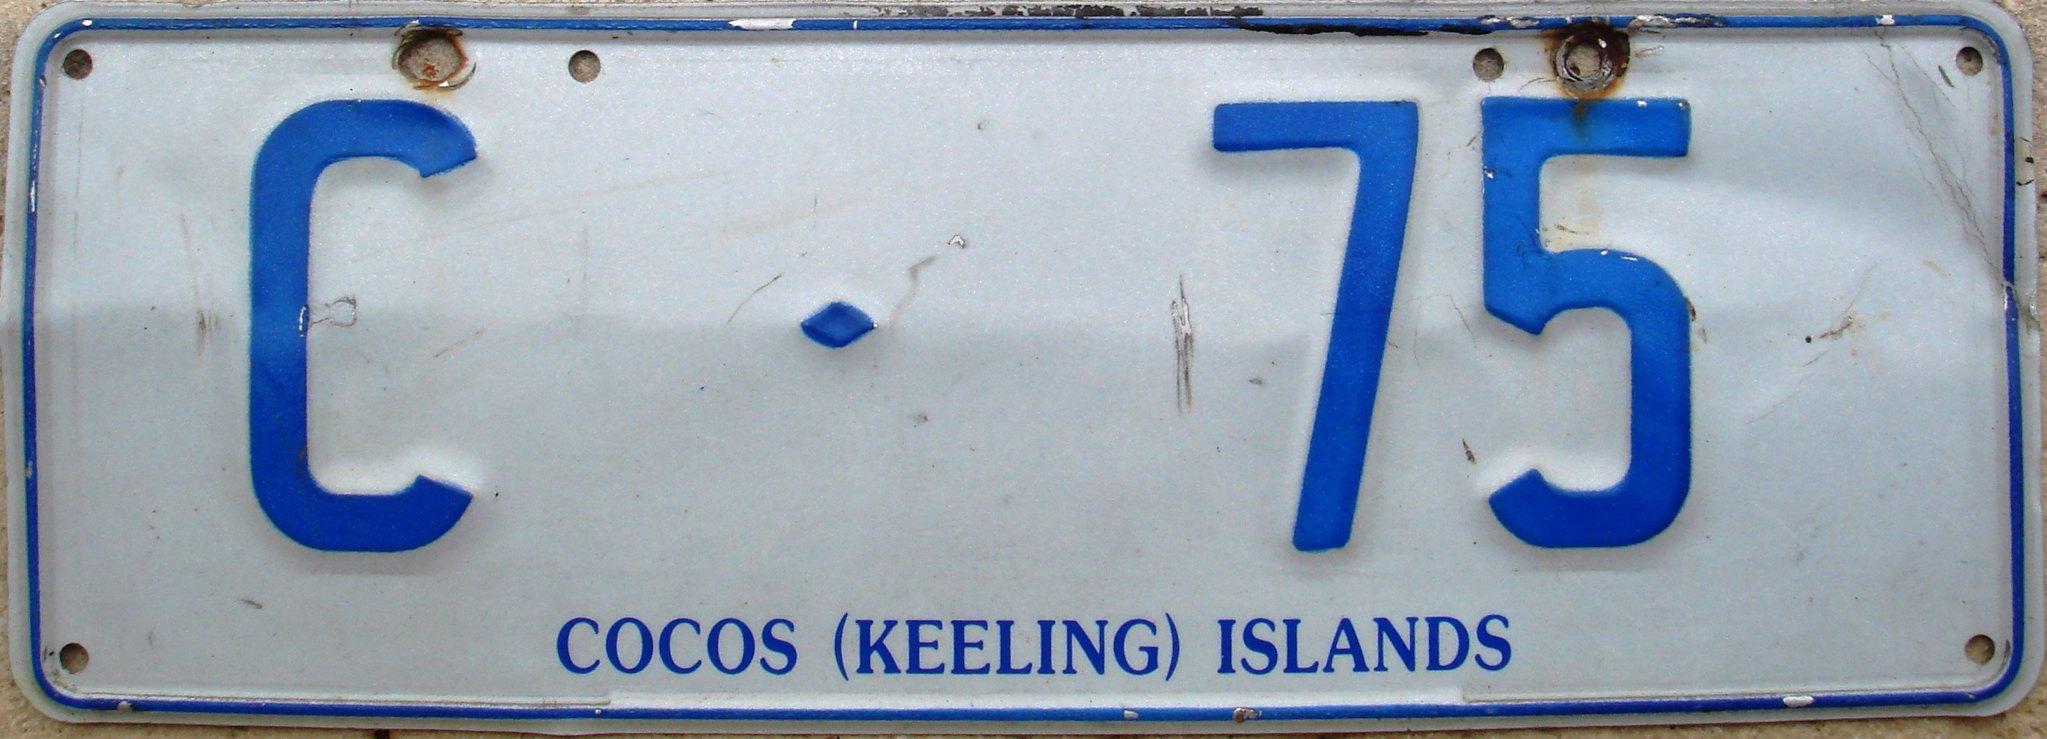 Cocos Keeling Islands Jobs